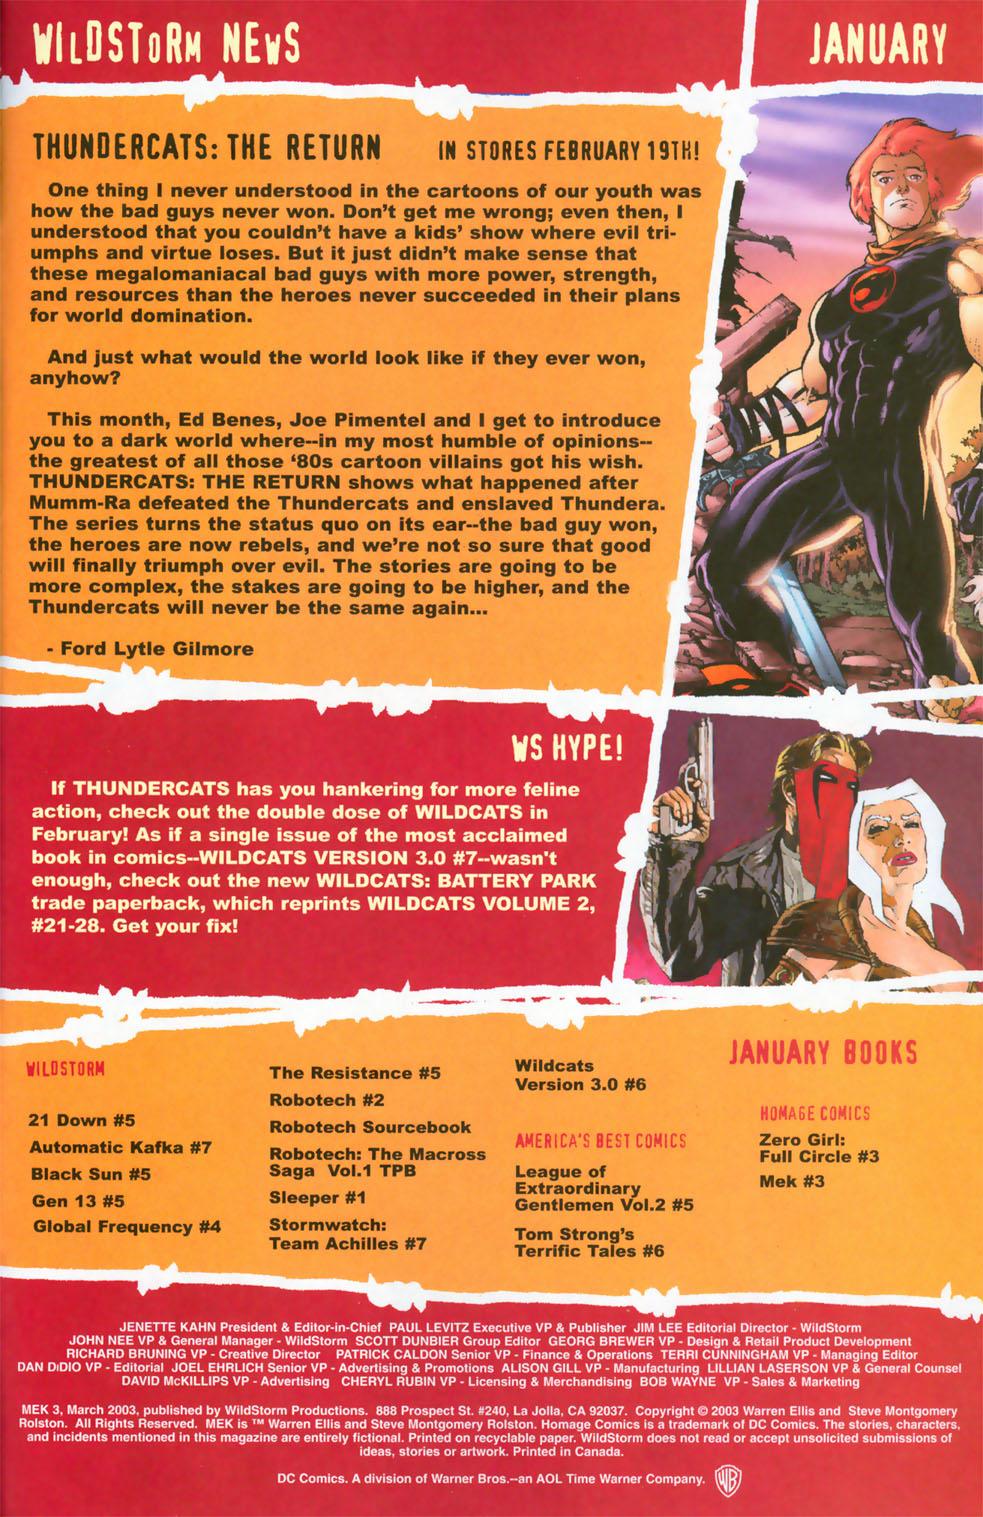 Read online Mek comic -  Issue #3 - 21